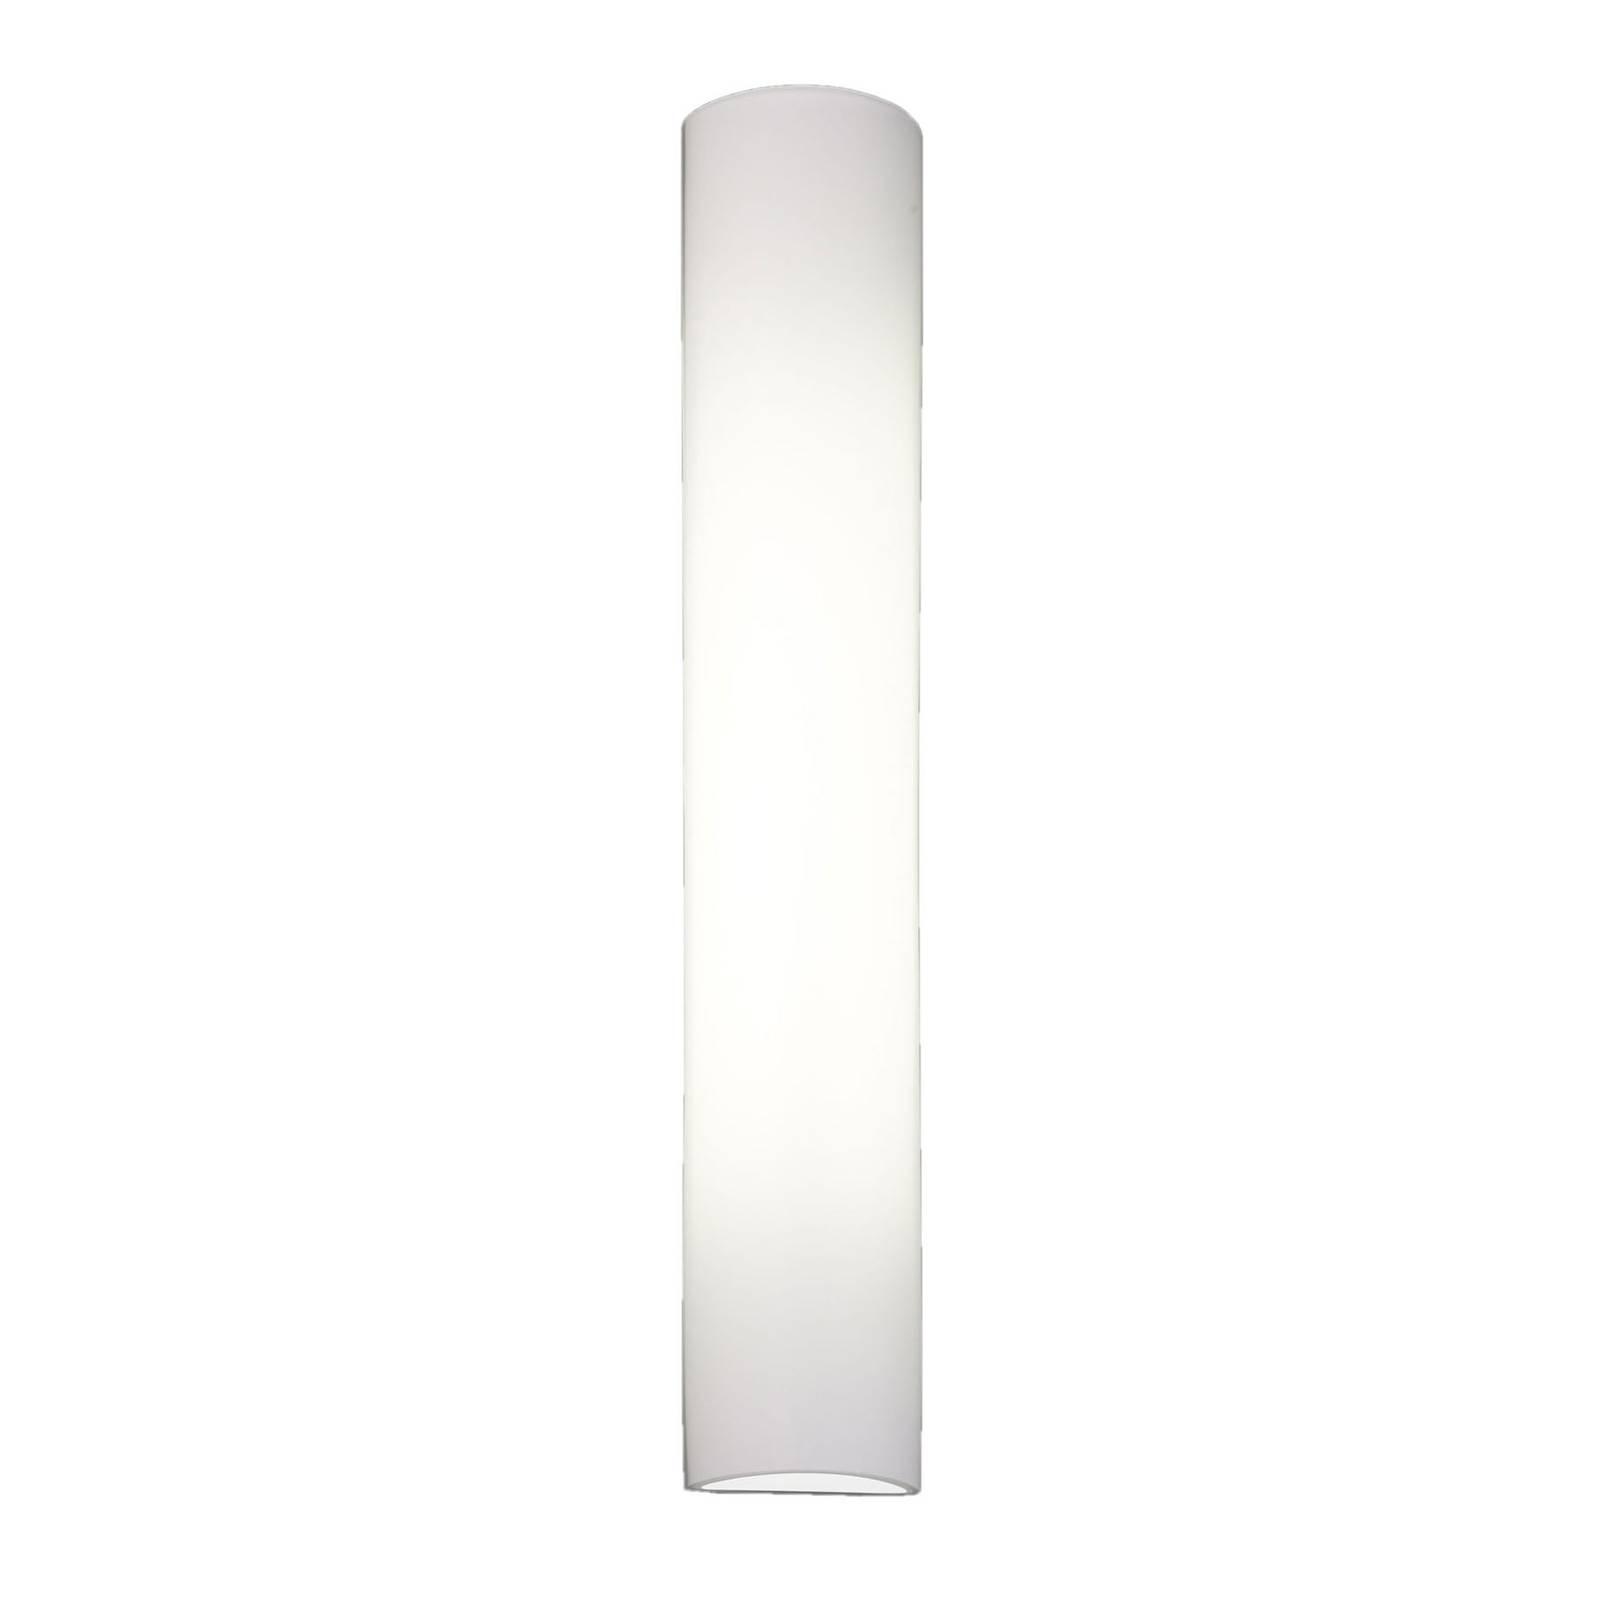 BANKAMP Cromo -LED-seinävalaisin lasia, 40 cm